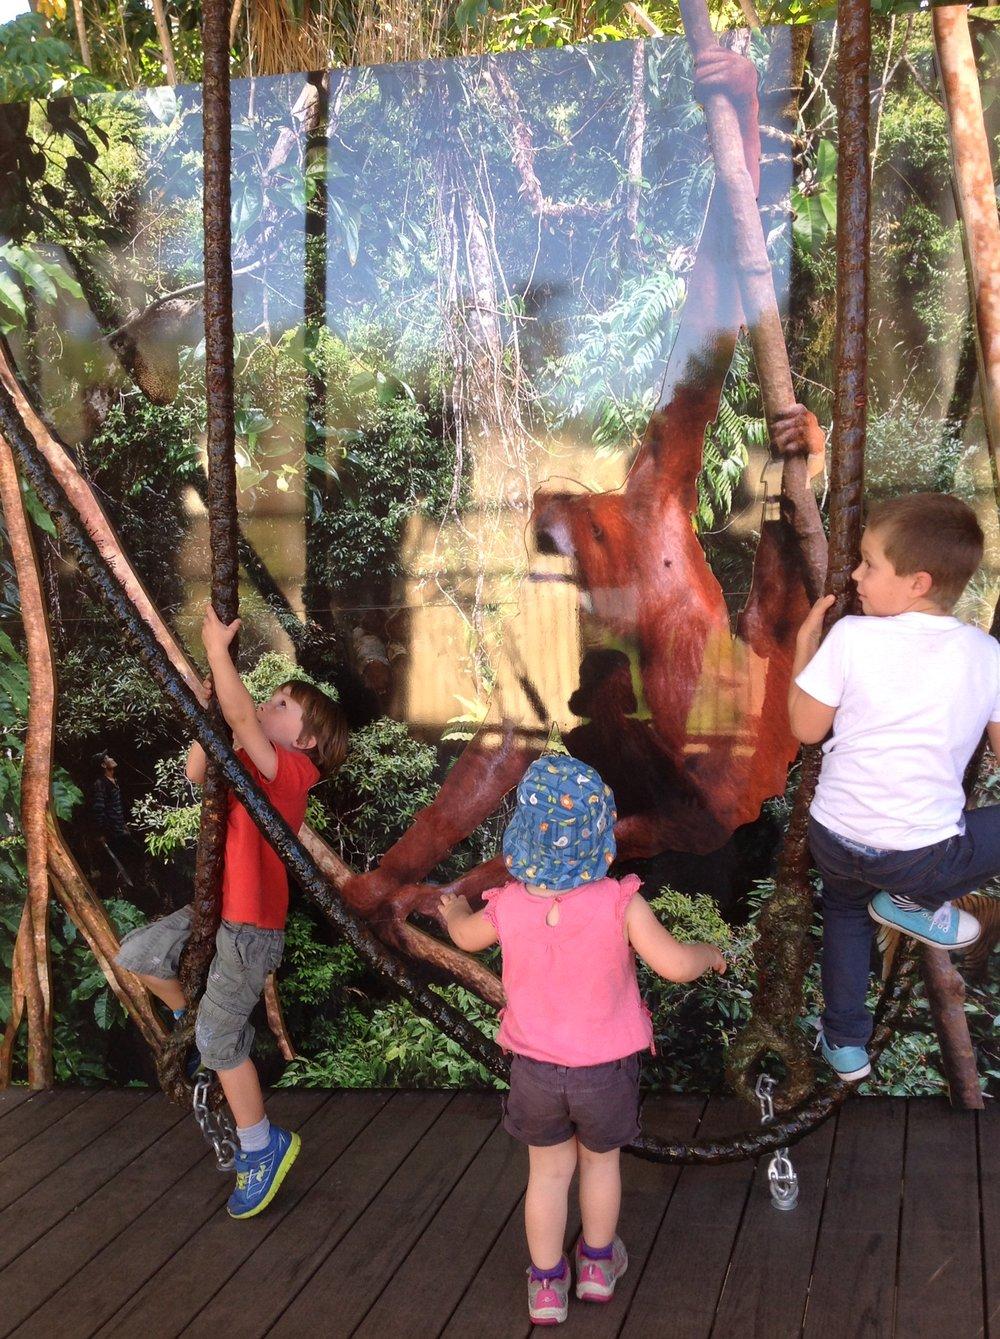 stay in the trees Perth Zoo Orangutan 2014.jpg